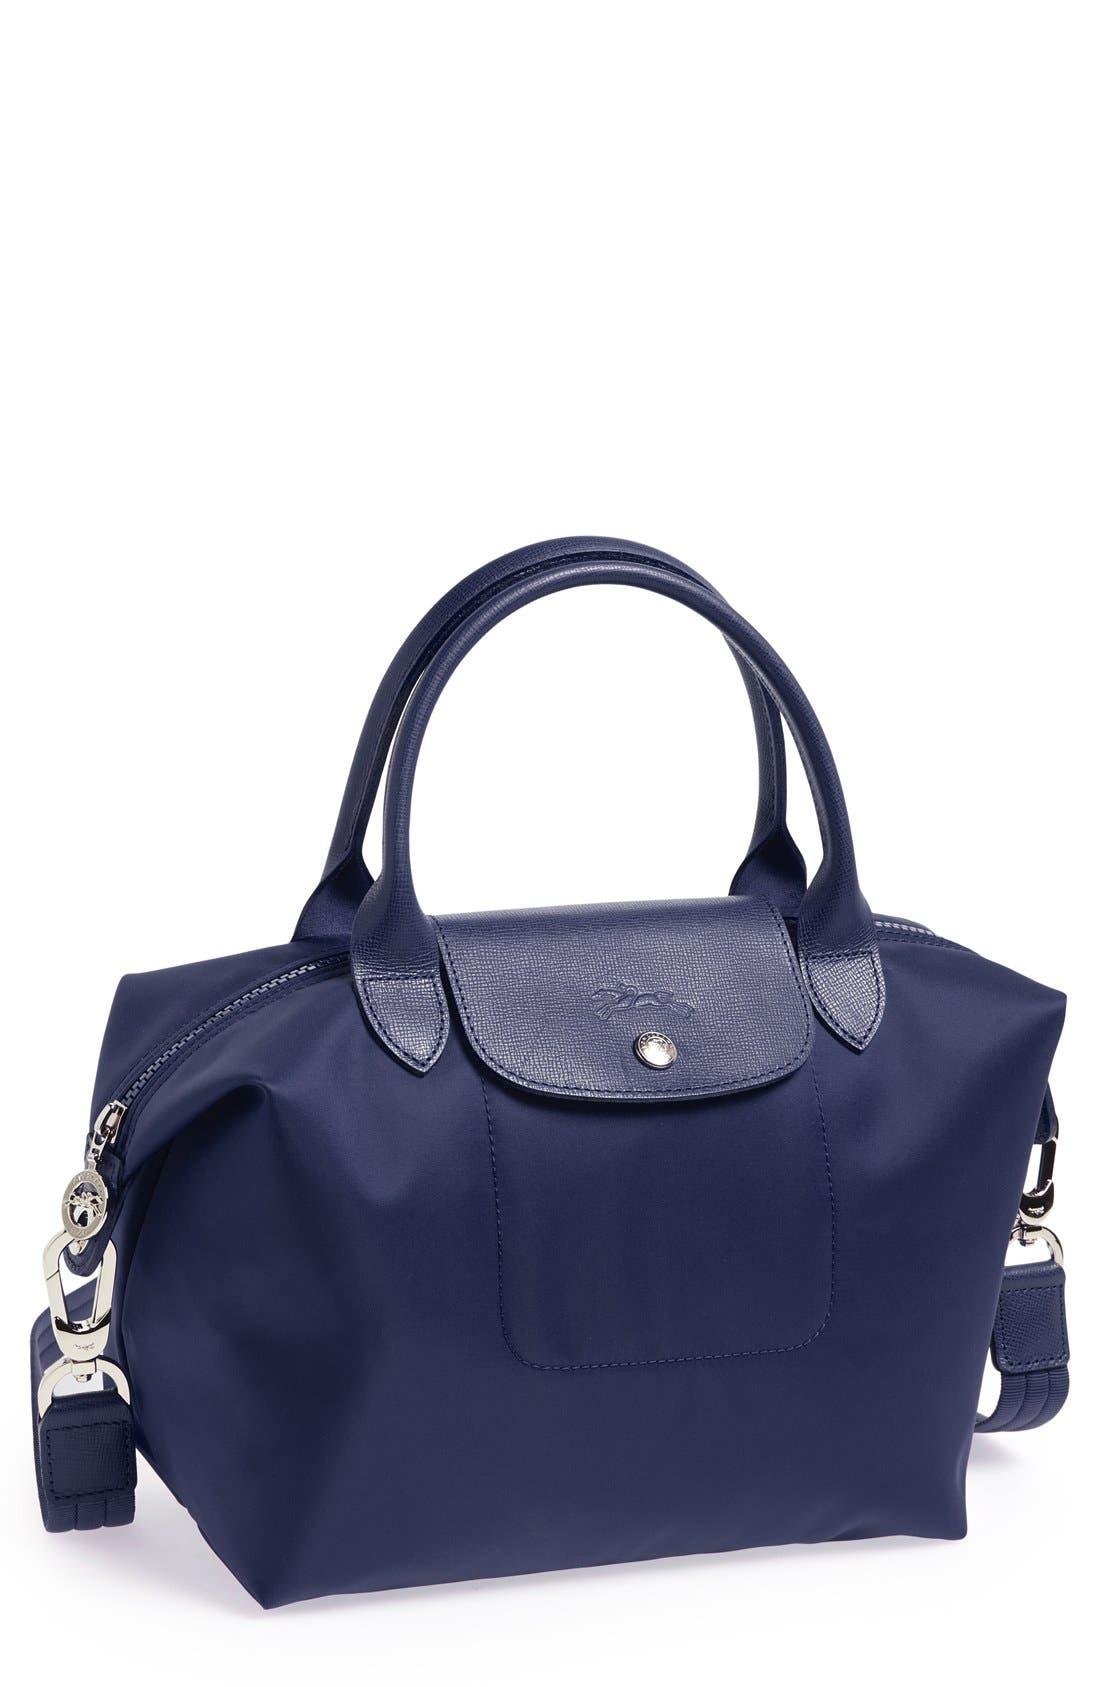 Alternate Image 1 Selected - Longchamp 'Small Le Pliage Neo' Nylon Tote